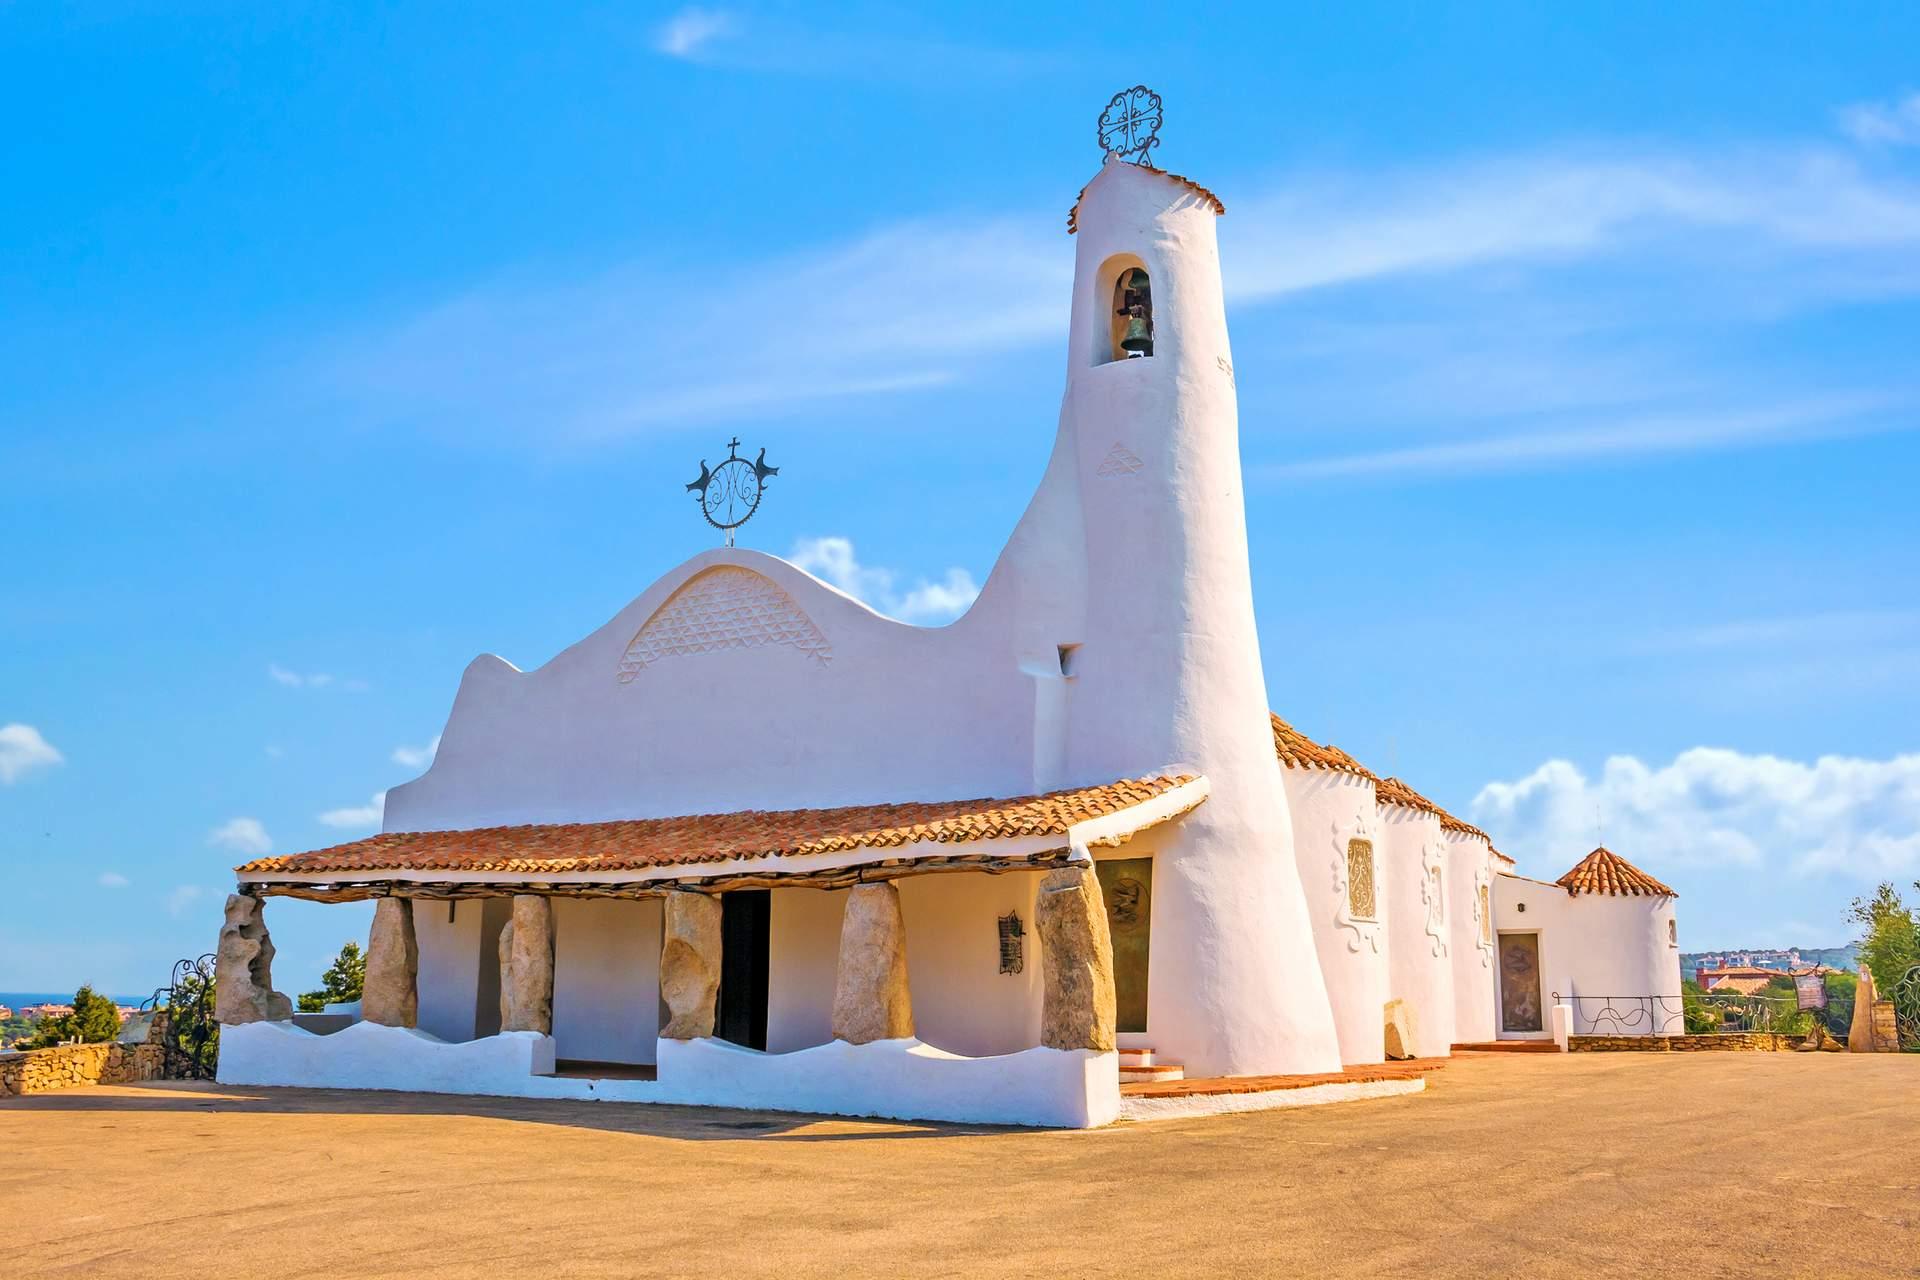 Kirche in Porto Cervo an der Costa Smeralda